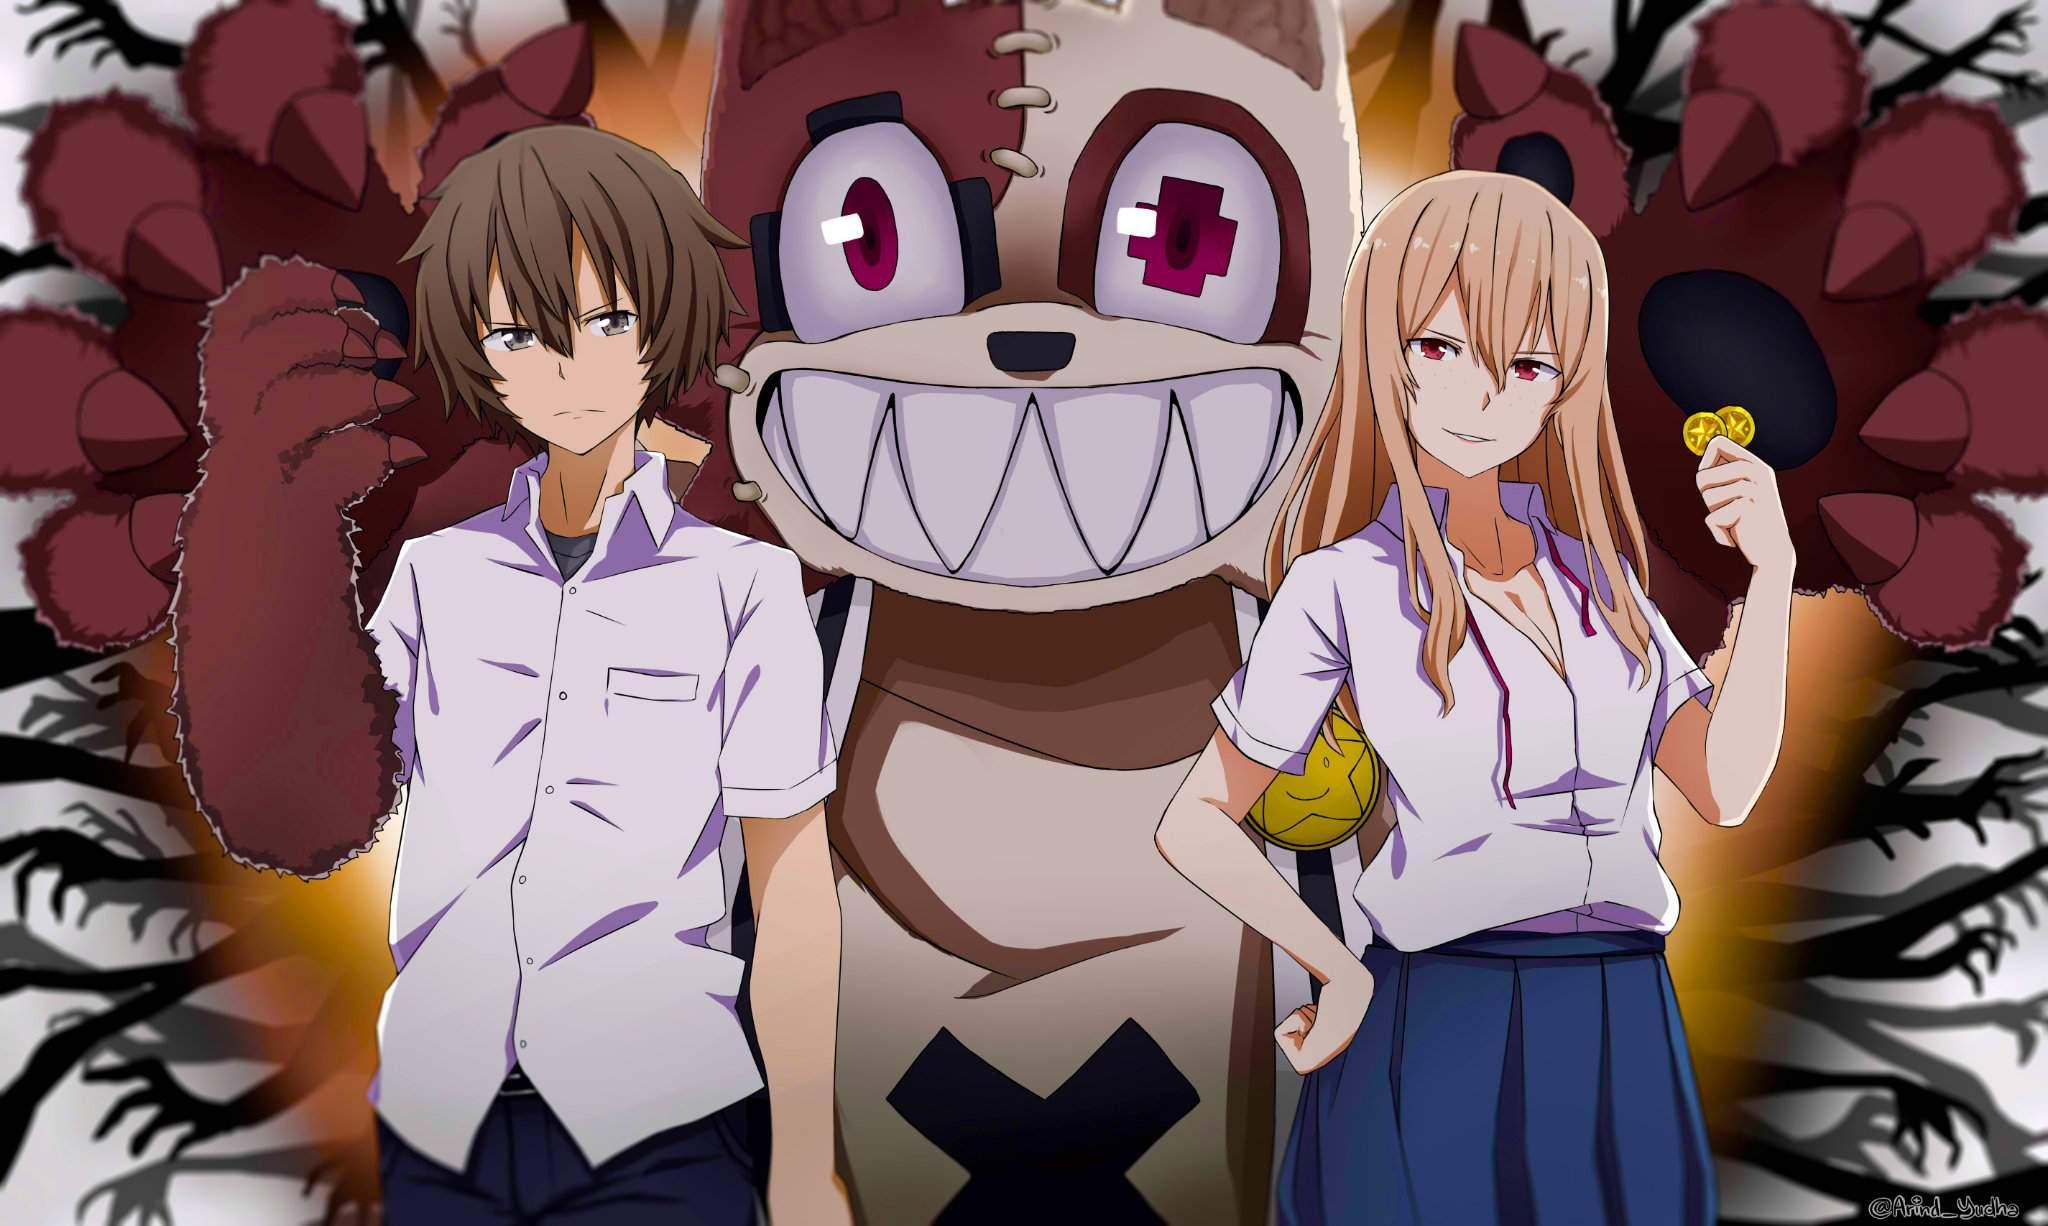 Horror Anime with Weak Male MC Like Don't Mess With Me, Miss Nagatoro, Gleipnir